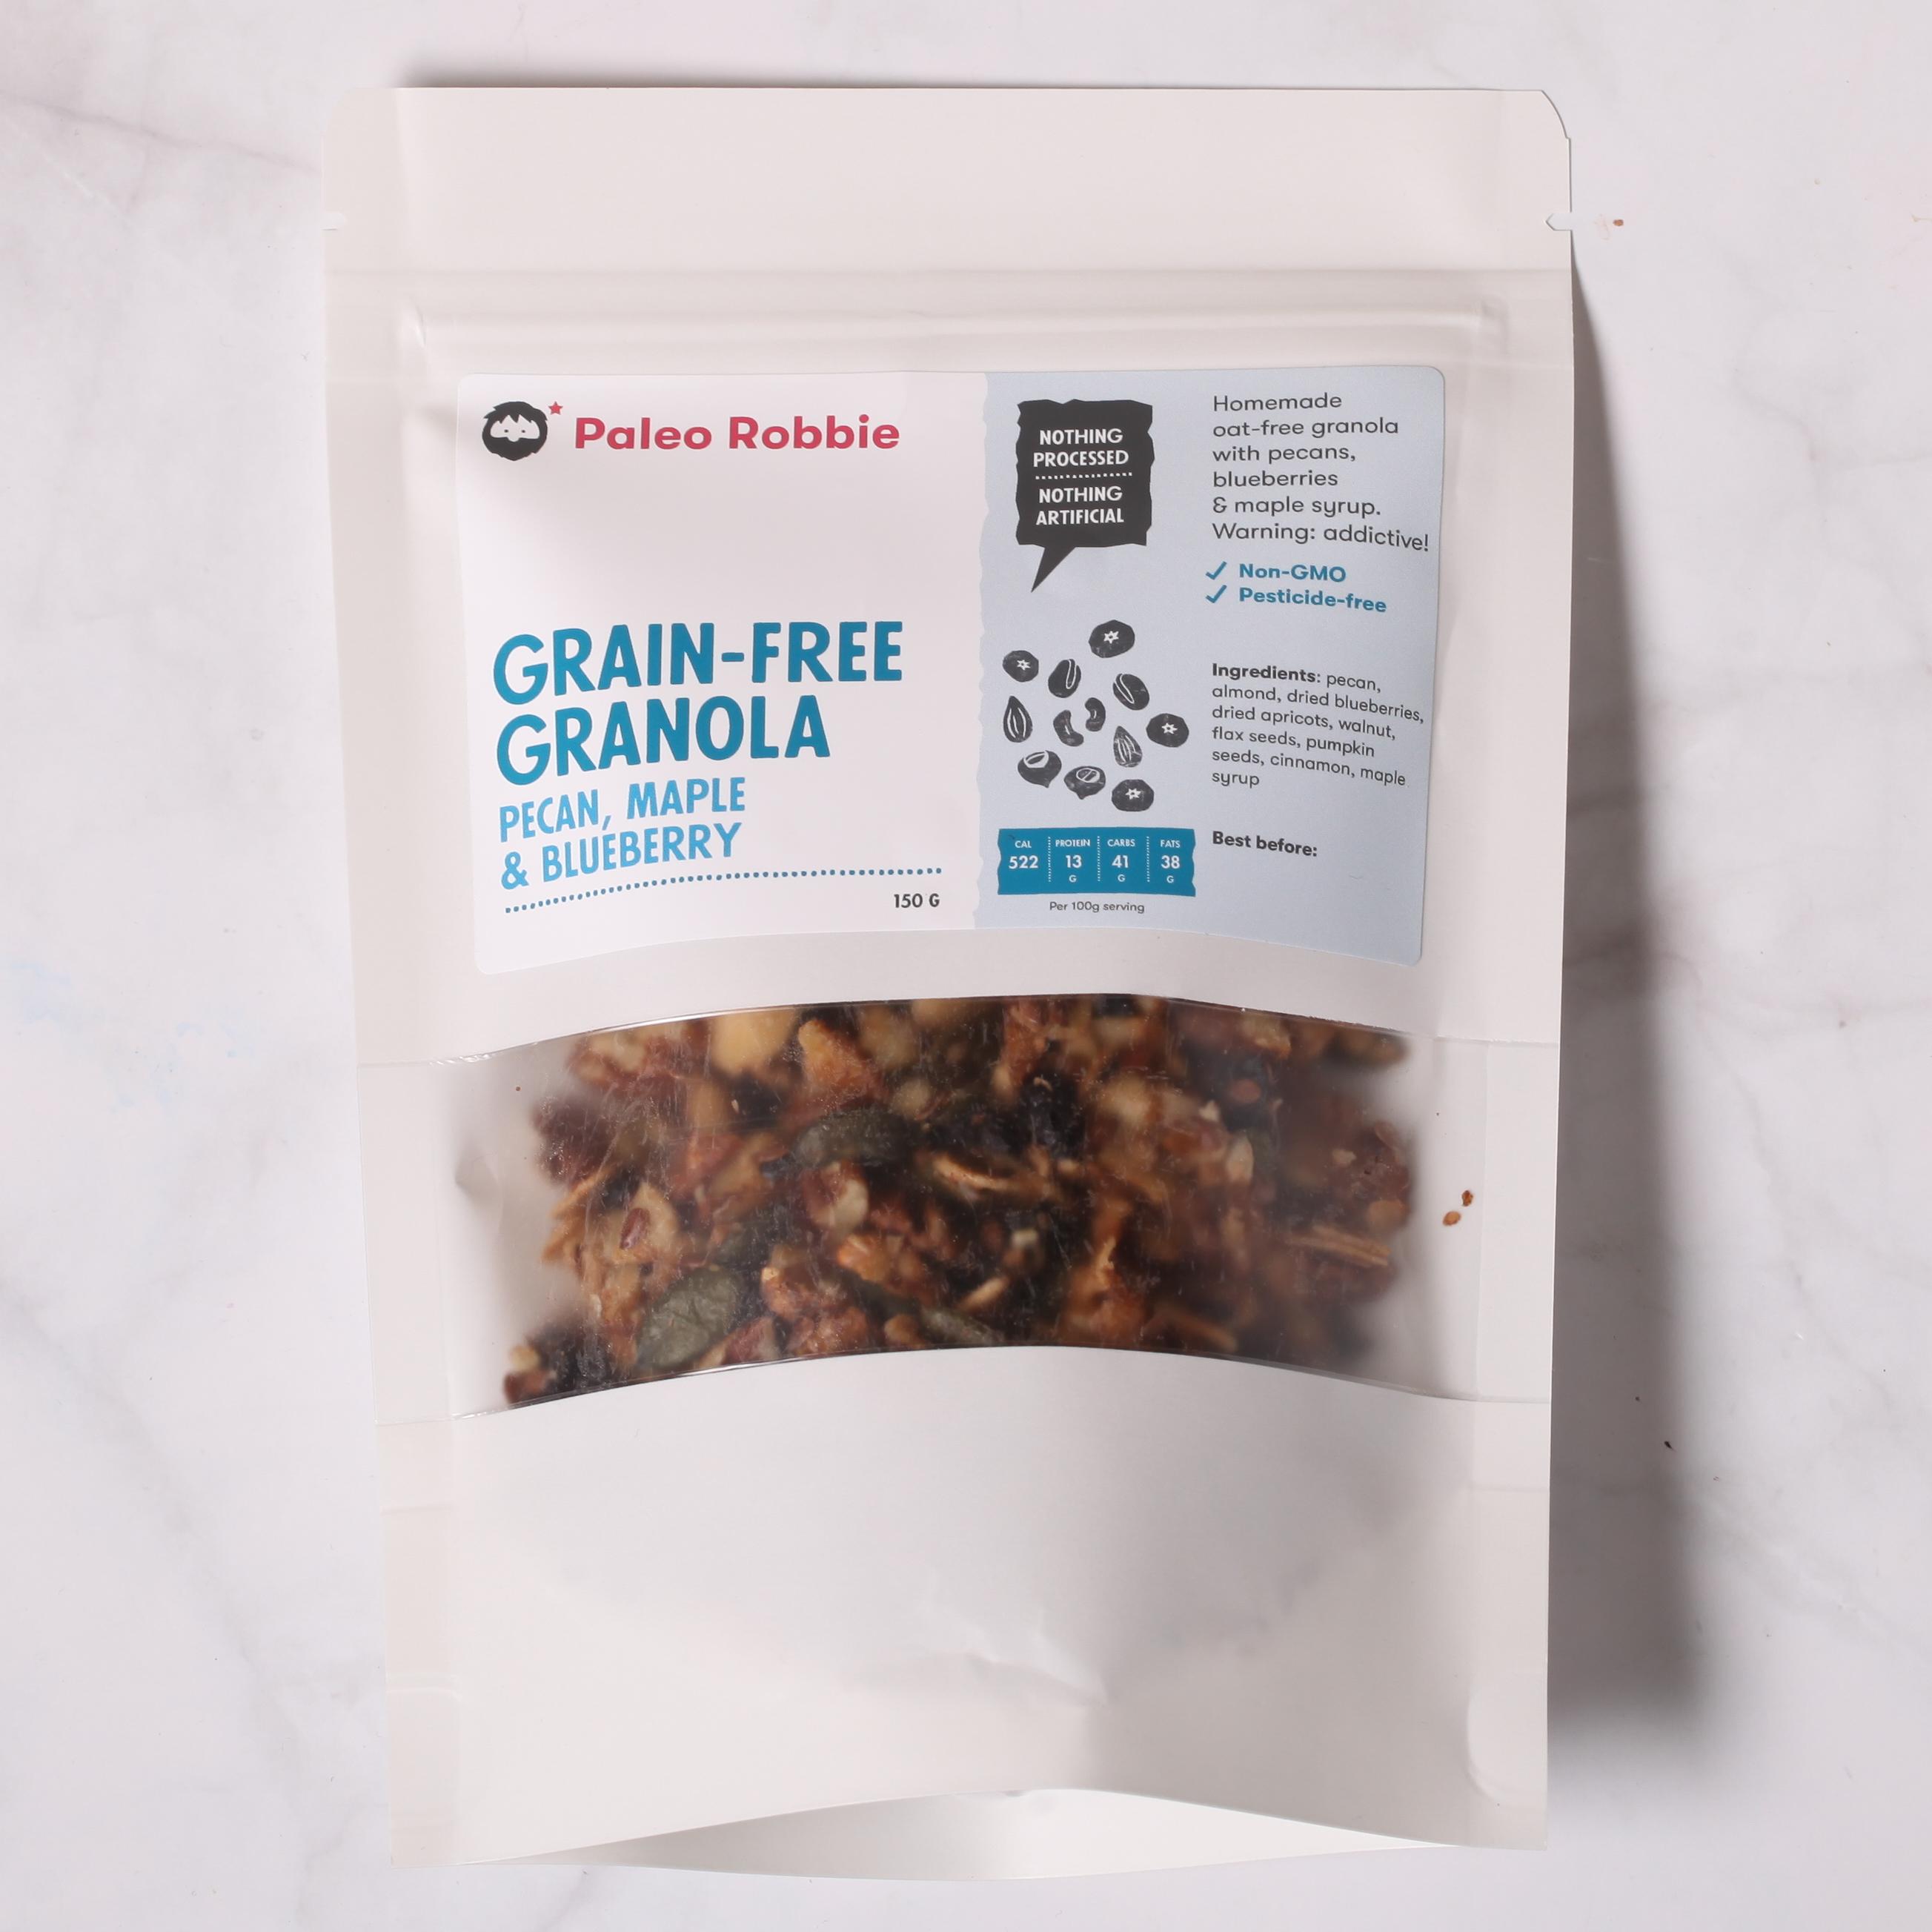 Grain-free Granola: Pecan, Maple & Blueberry 150gr